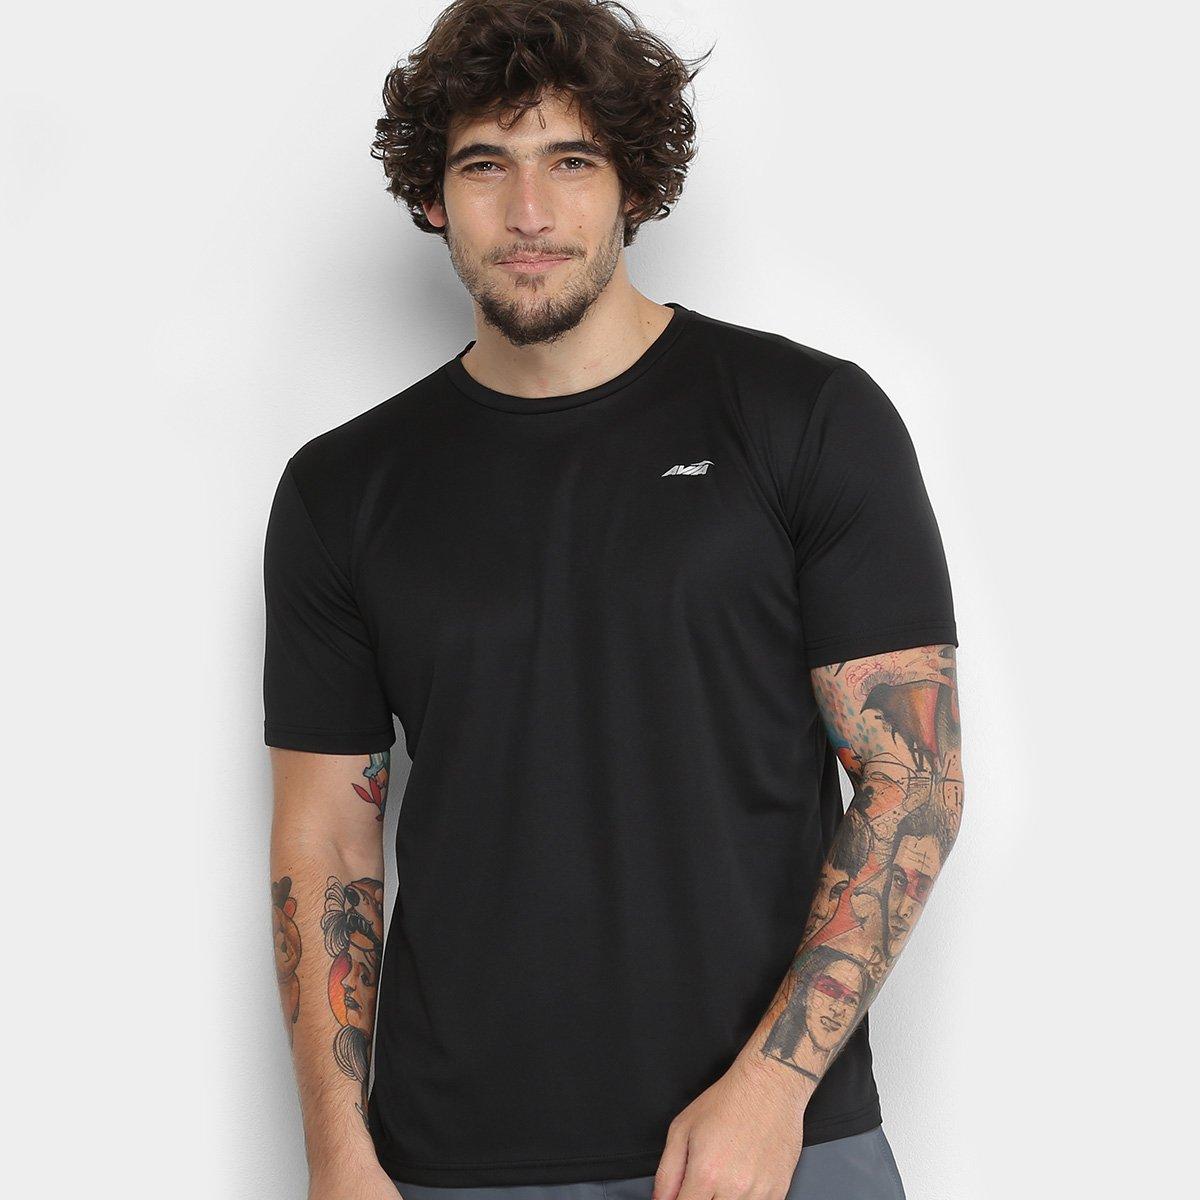 fab62f152 Camiseta Avia Bummer Masculina